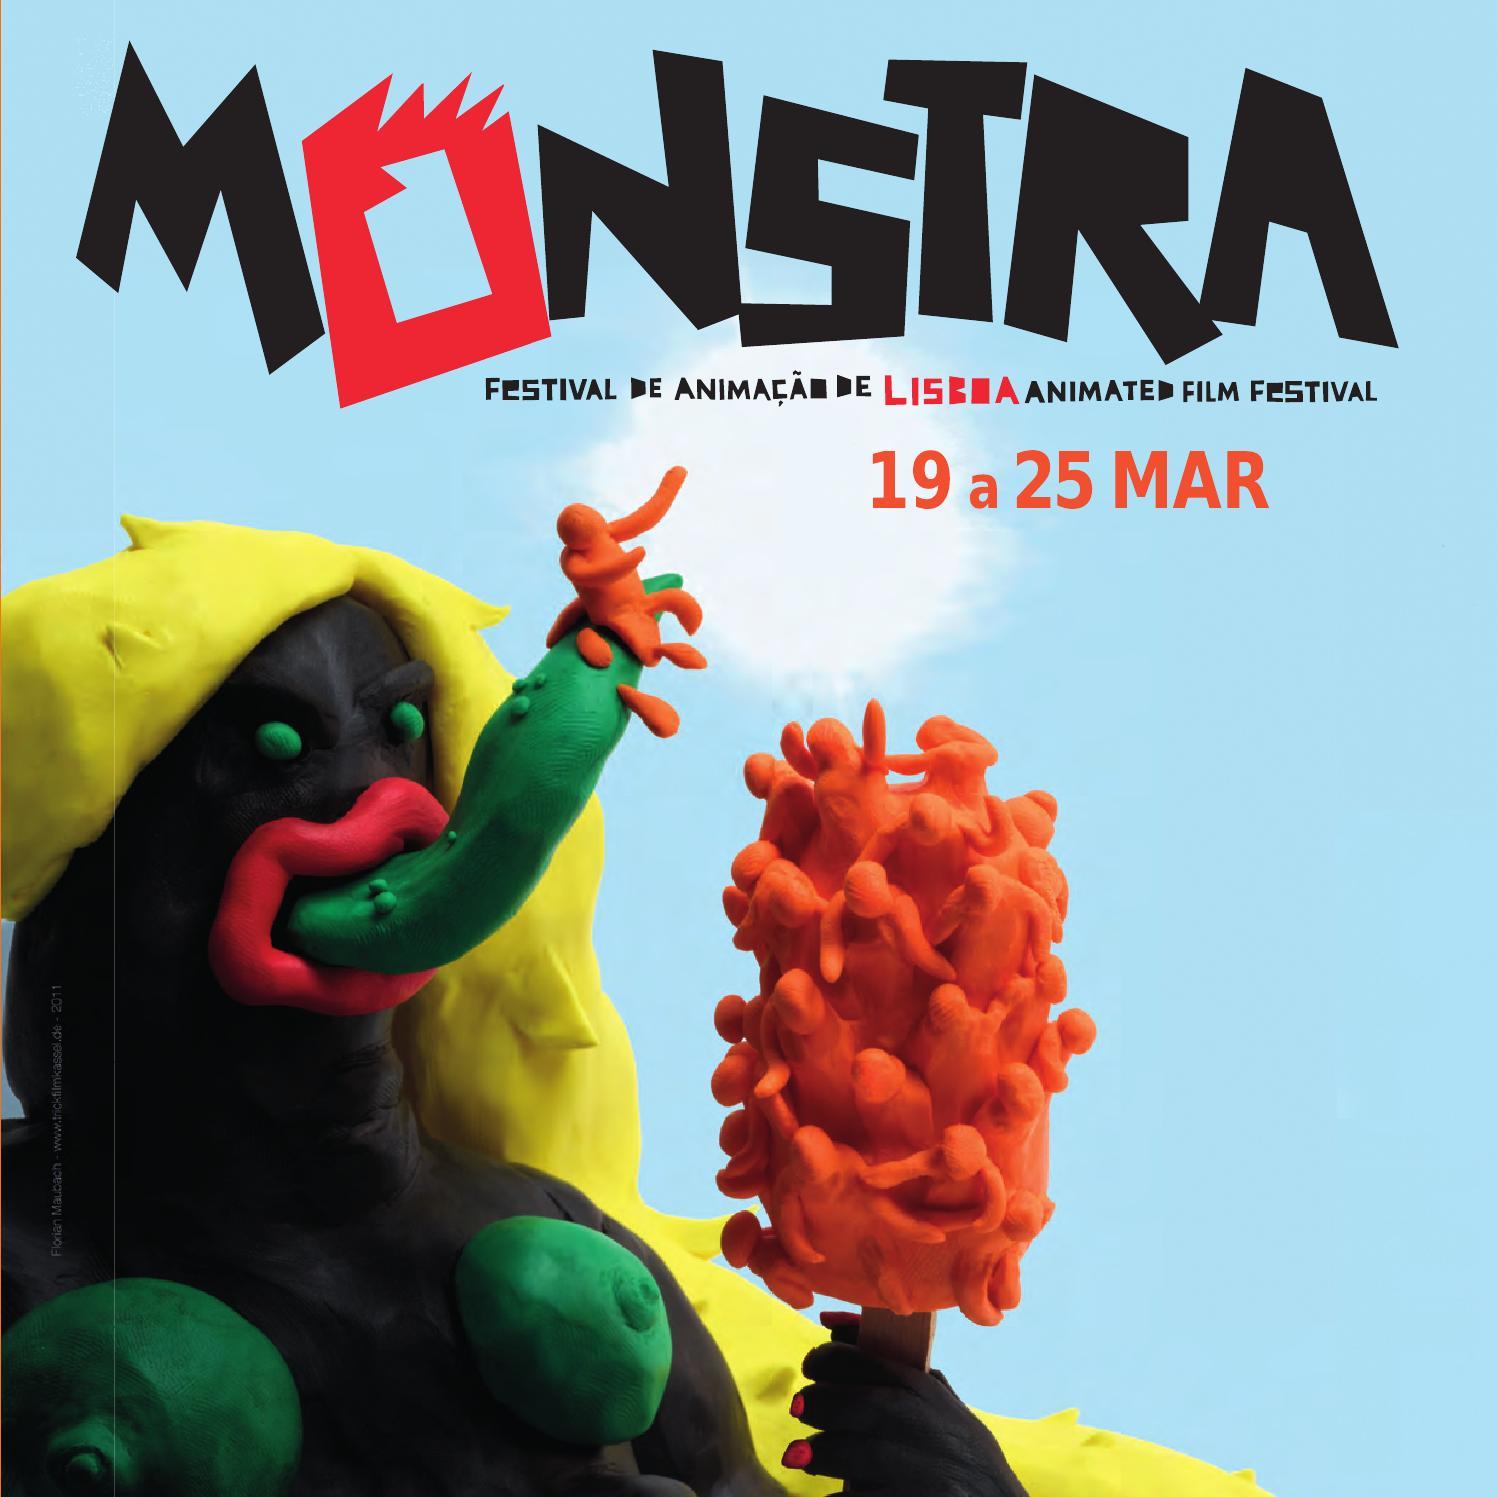 Catálogo MONSTRA 2012 by Jnrepresas - issuu